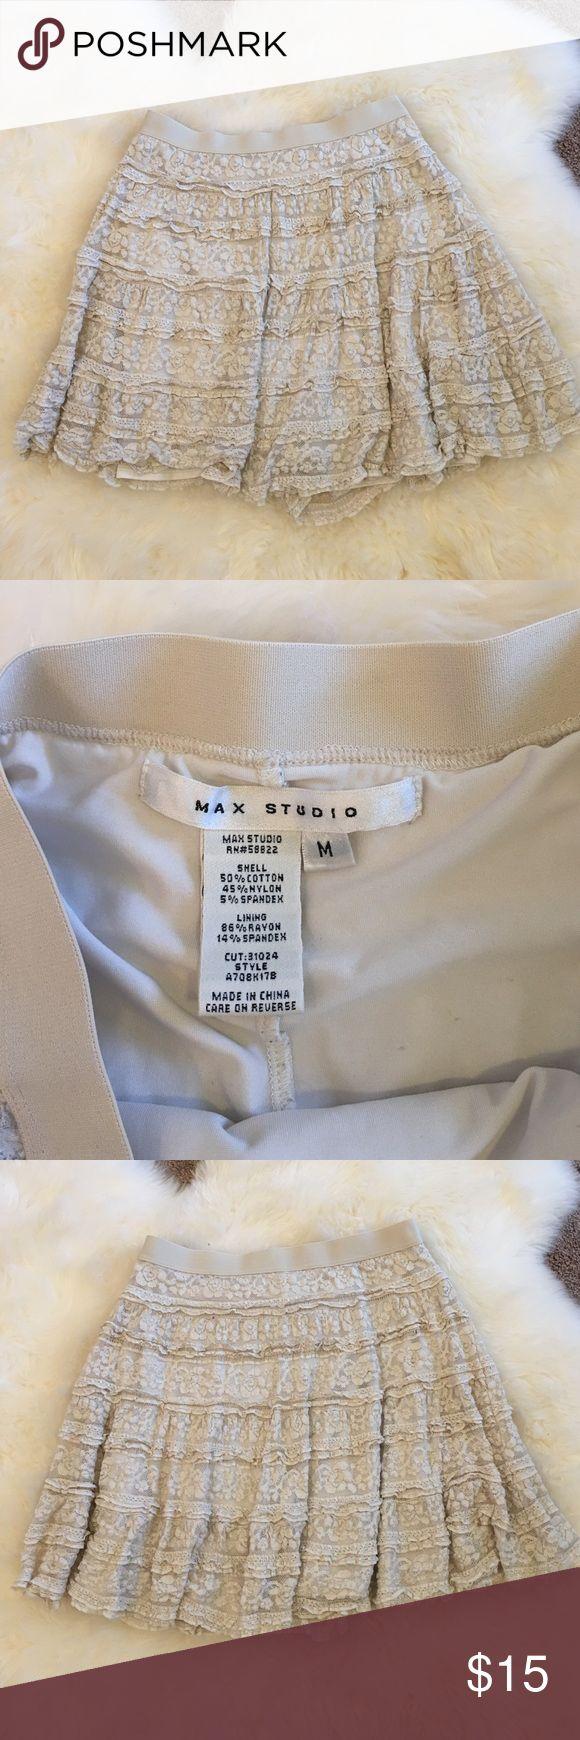 "Max Studio Lace Miniskirt Size Med Max Studio cream colored Lace Miniskirt. Elastic waistband, slip underneath. About 18"" long. Good condition, no visible damage. Size Medium. Max Studio Skirts Mini"